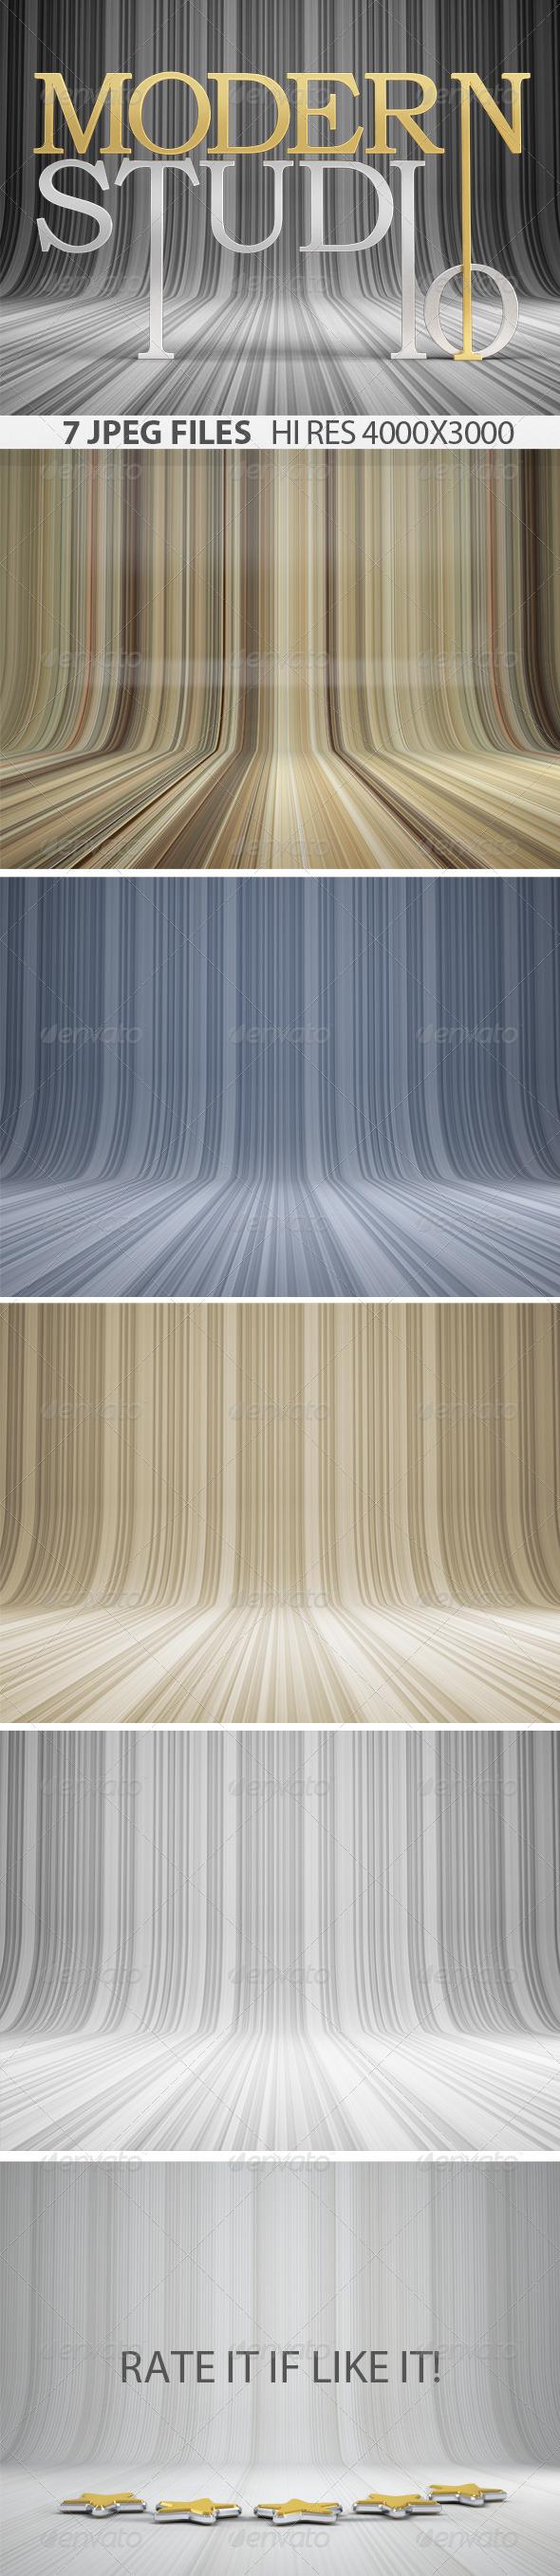 Modern Studio Background - 3D Backgrounds